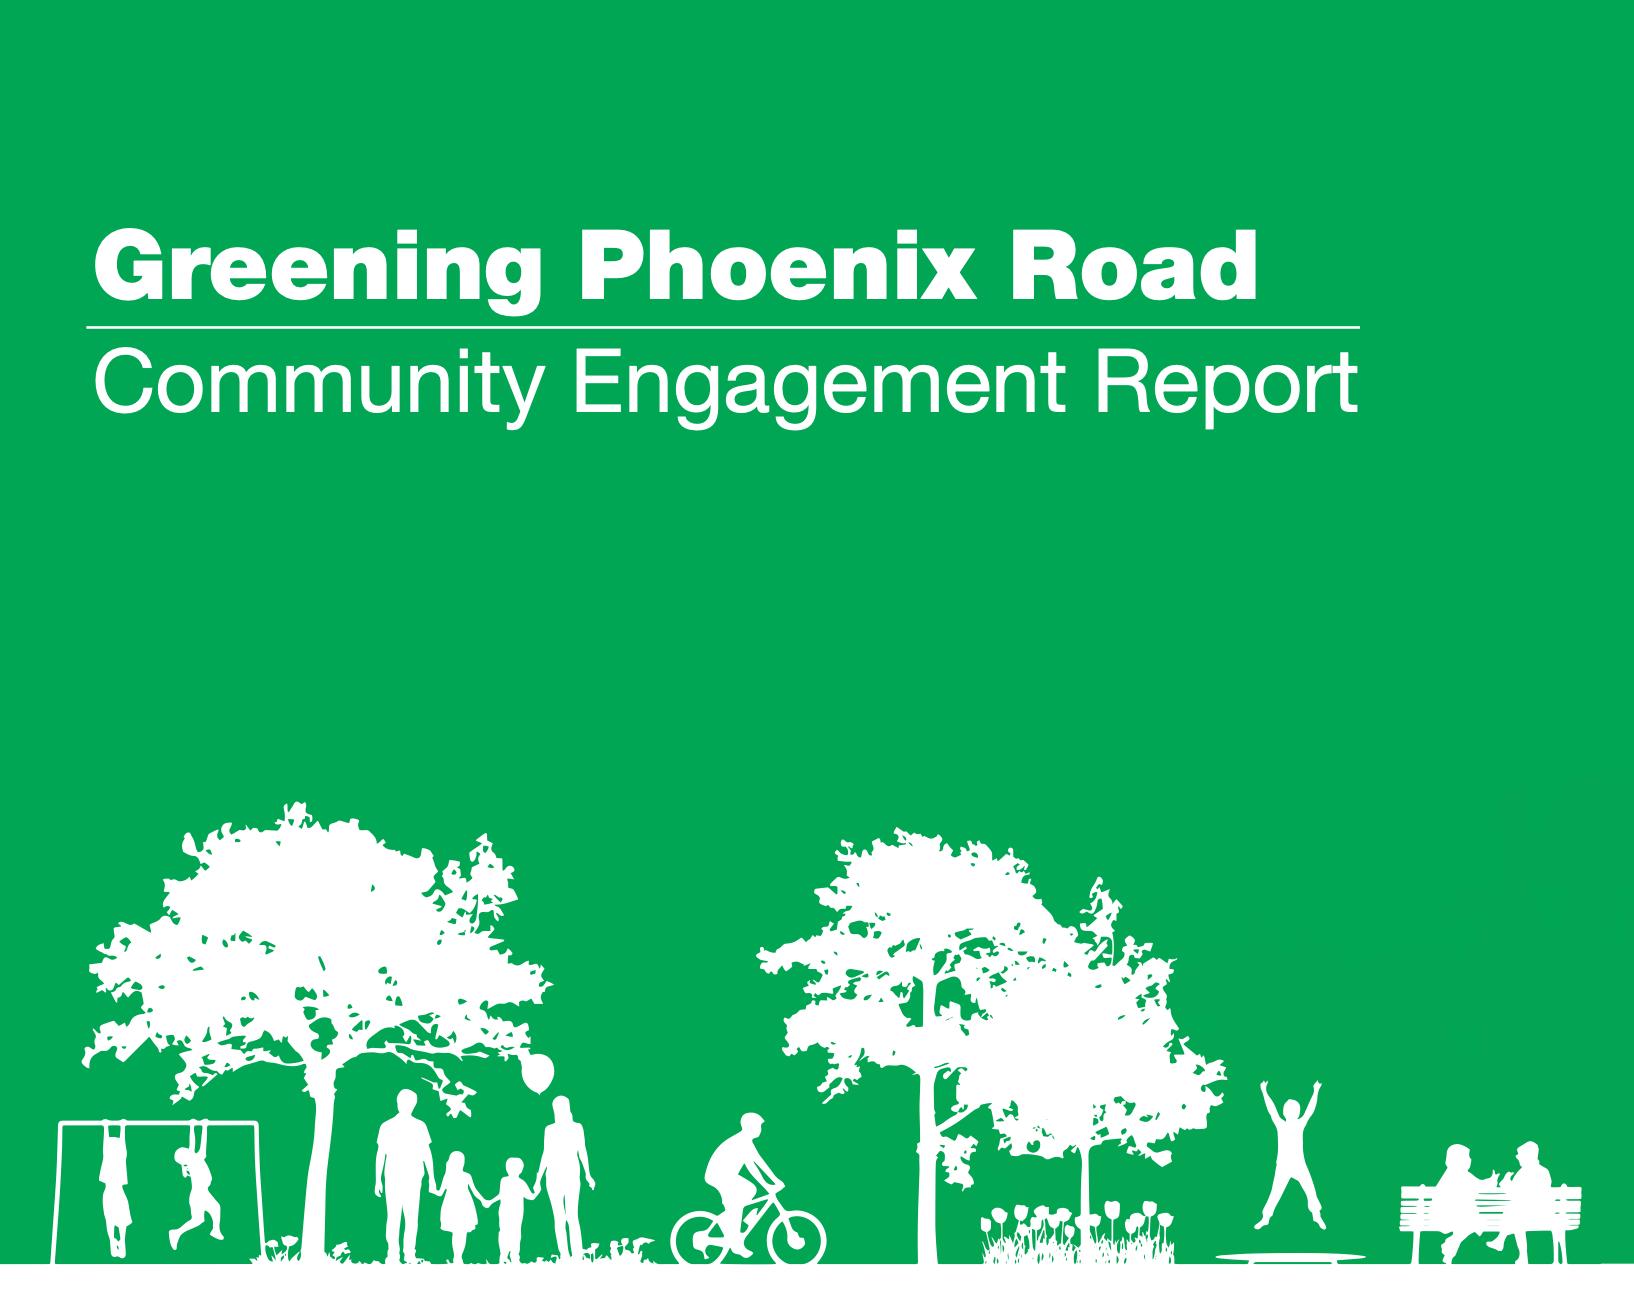 Greening Phoenix Road